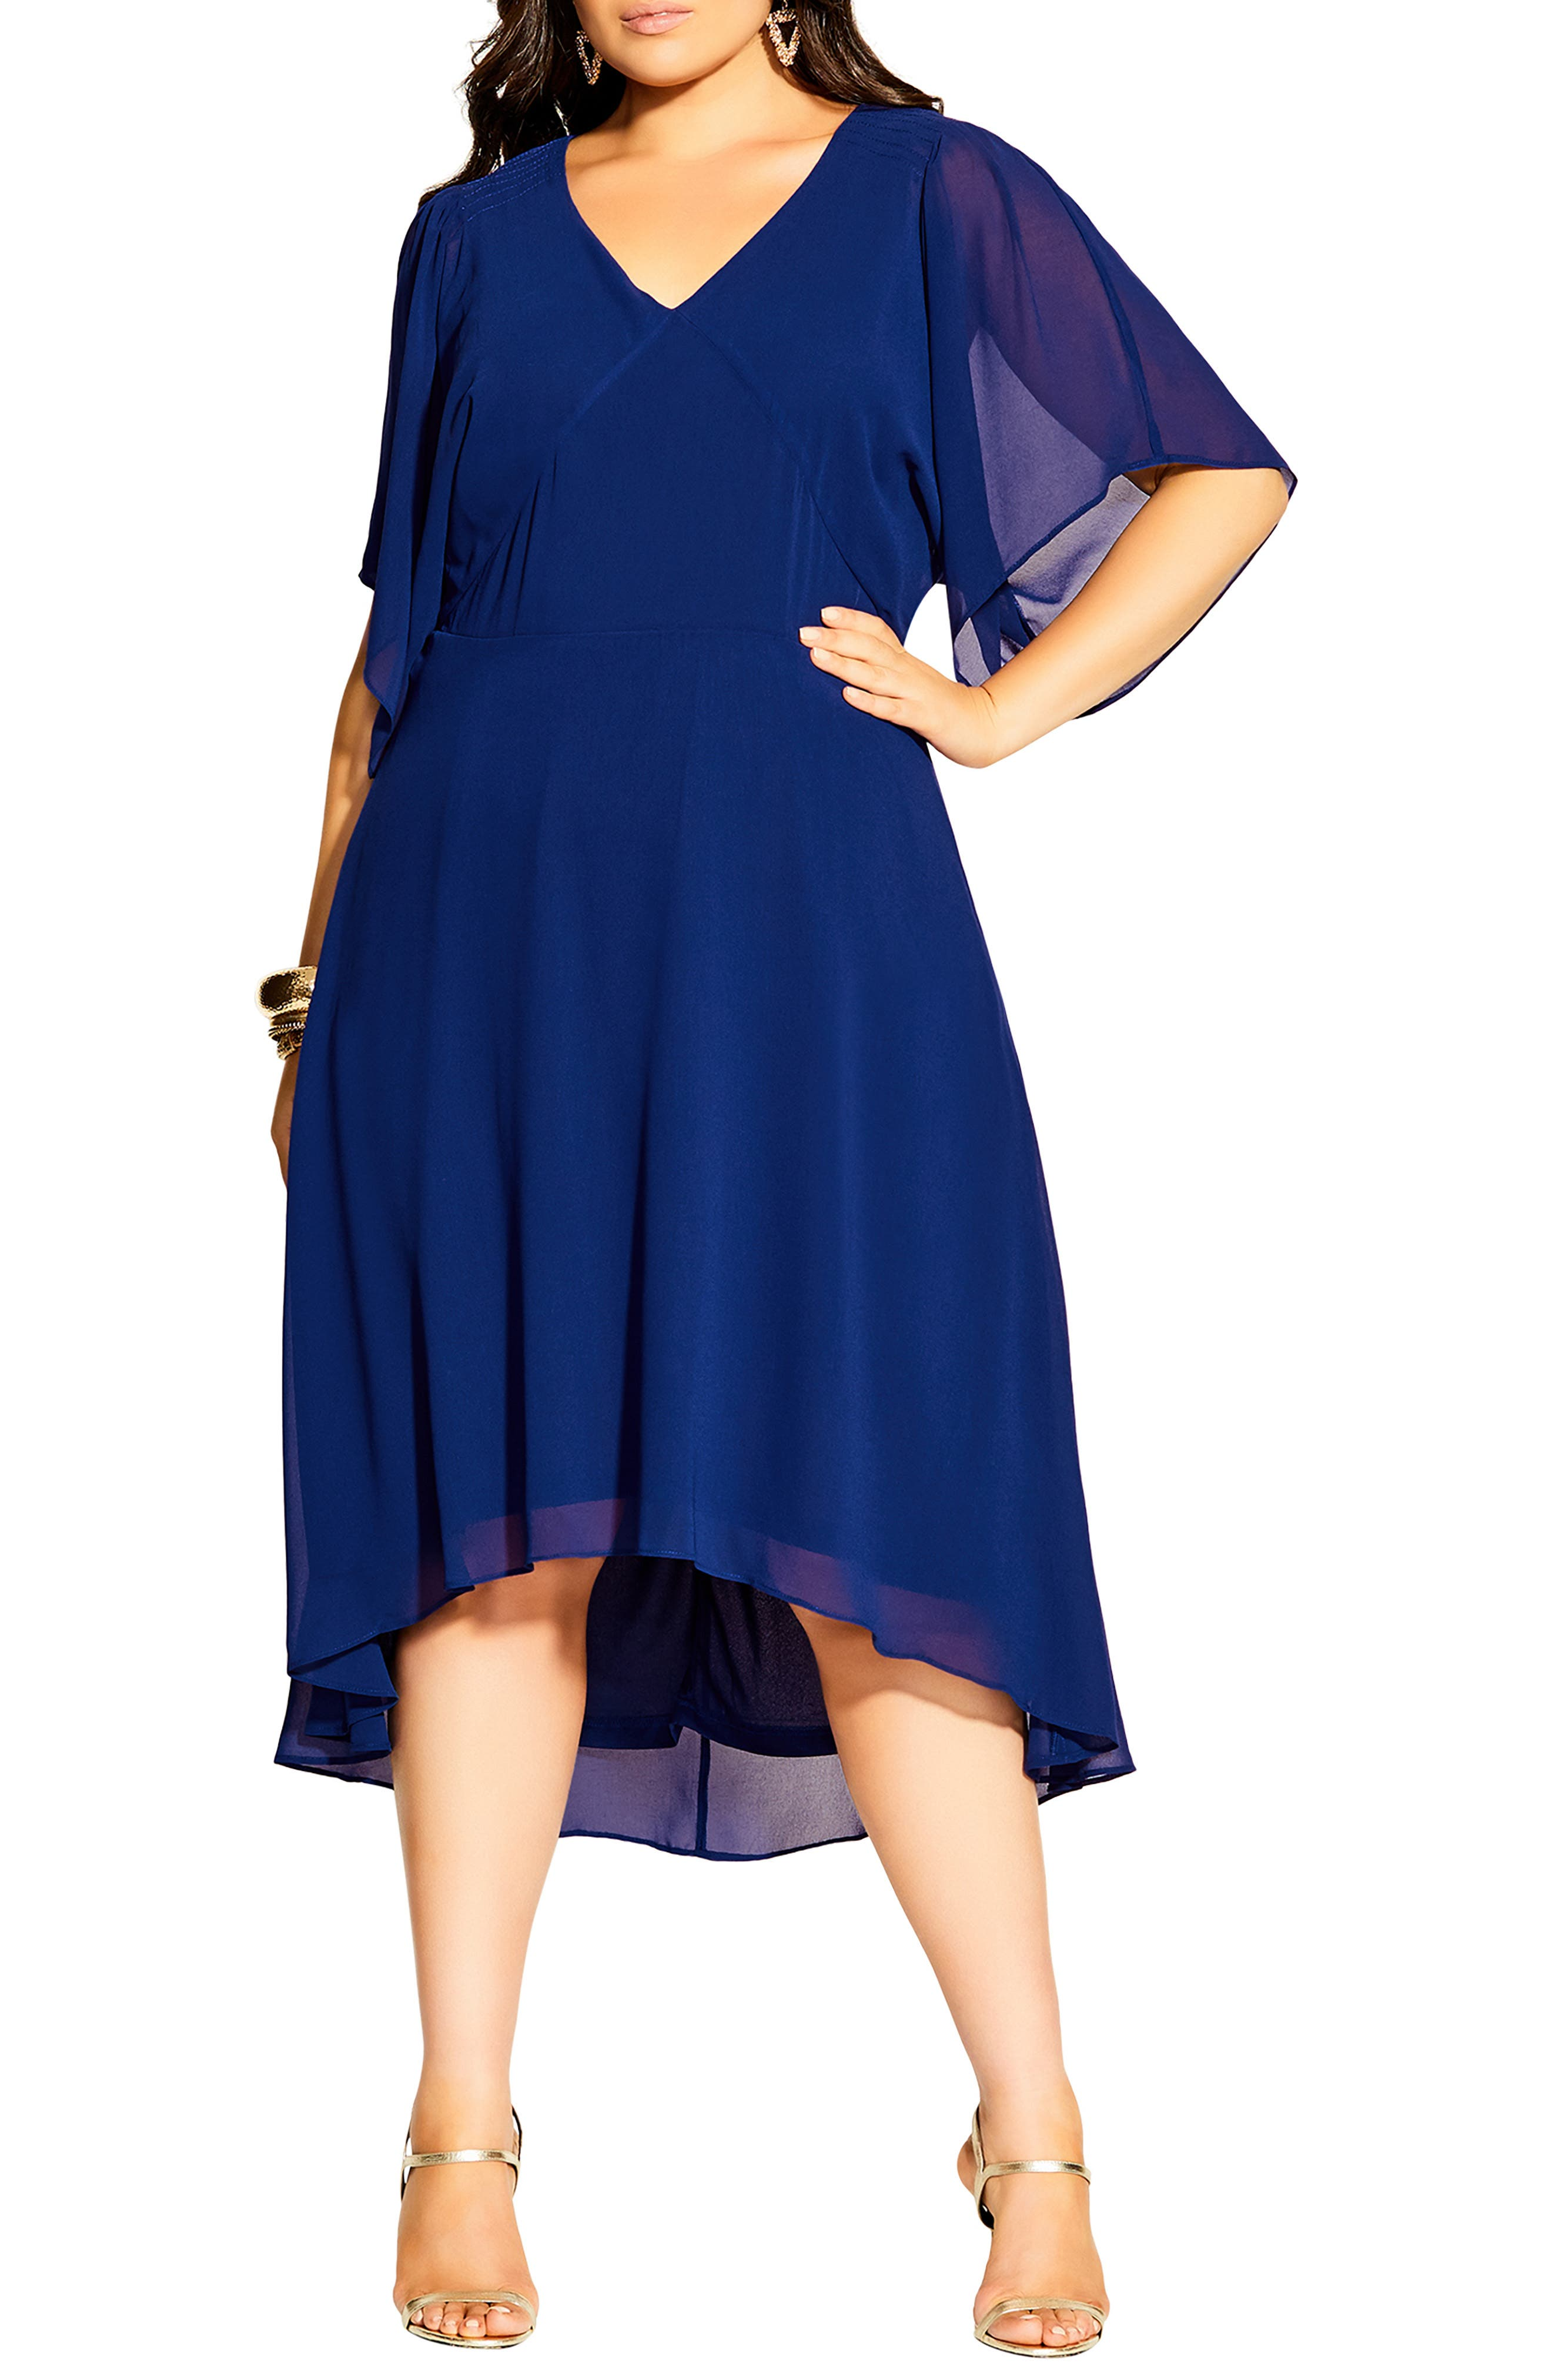 Vintage 1920s Dresses – Where to Buy Plus Size Womens City Chic Adore Midi Dress $119.00 AT vintagedancer.com